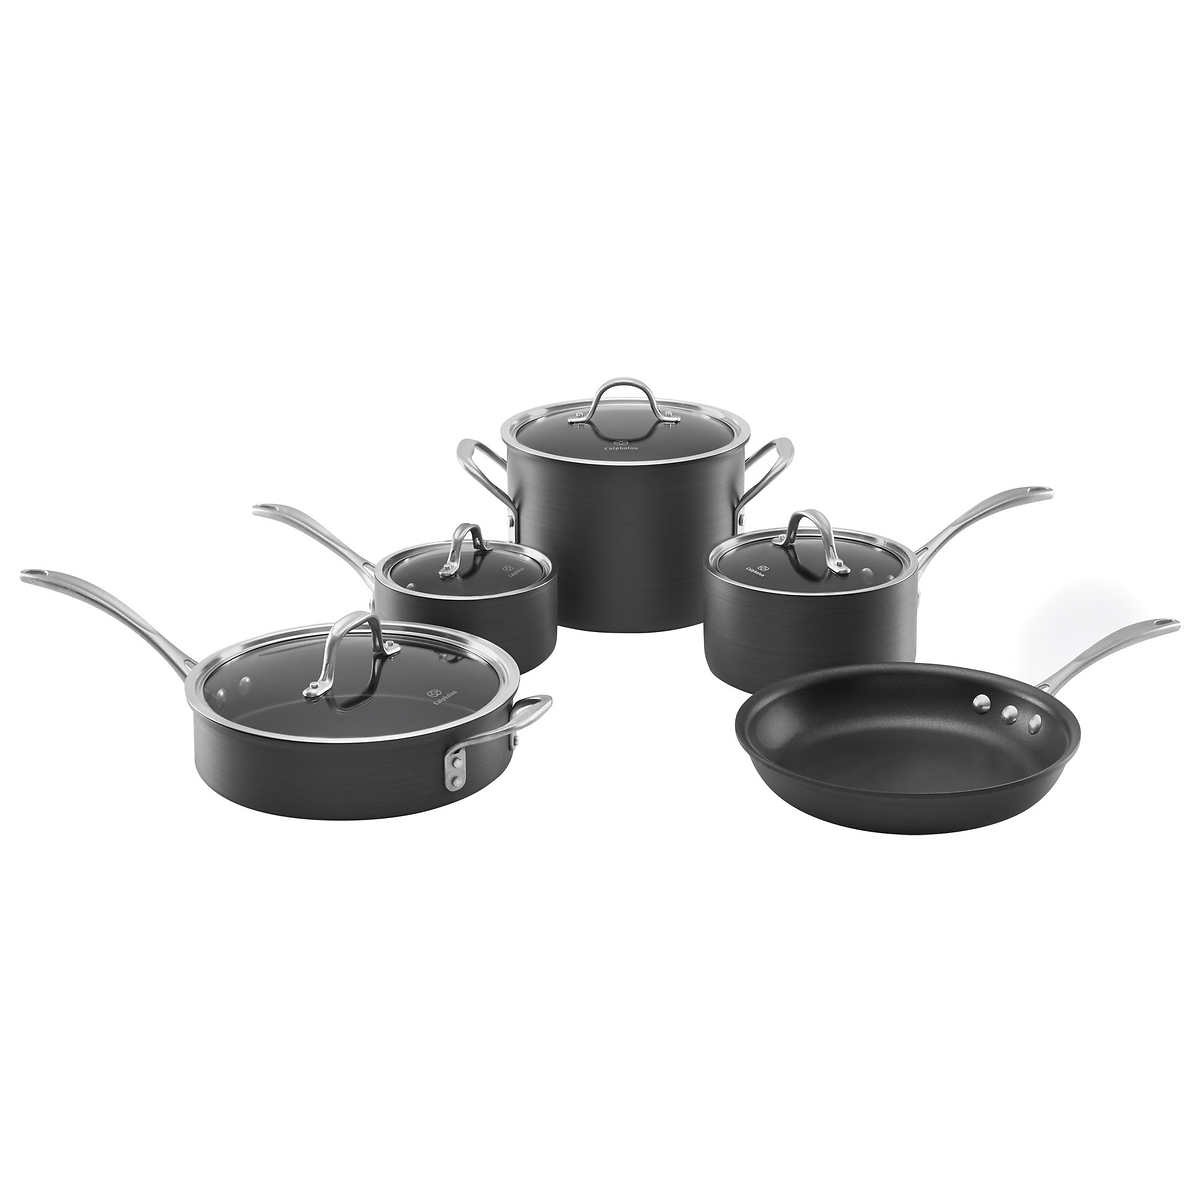 Calphalon 9 Piece Commercial Cookware Set Item 1083726 1